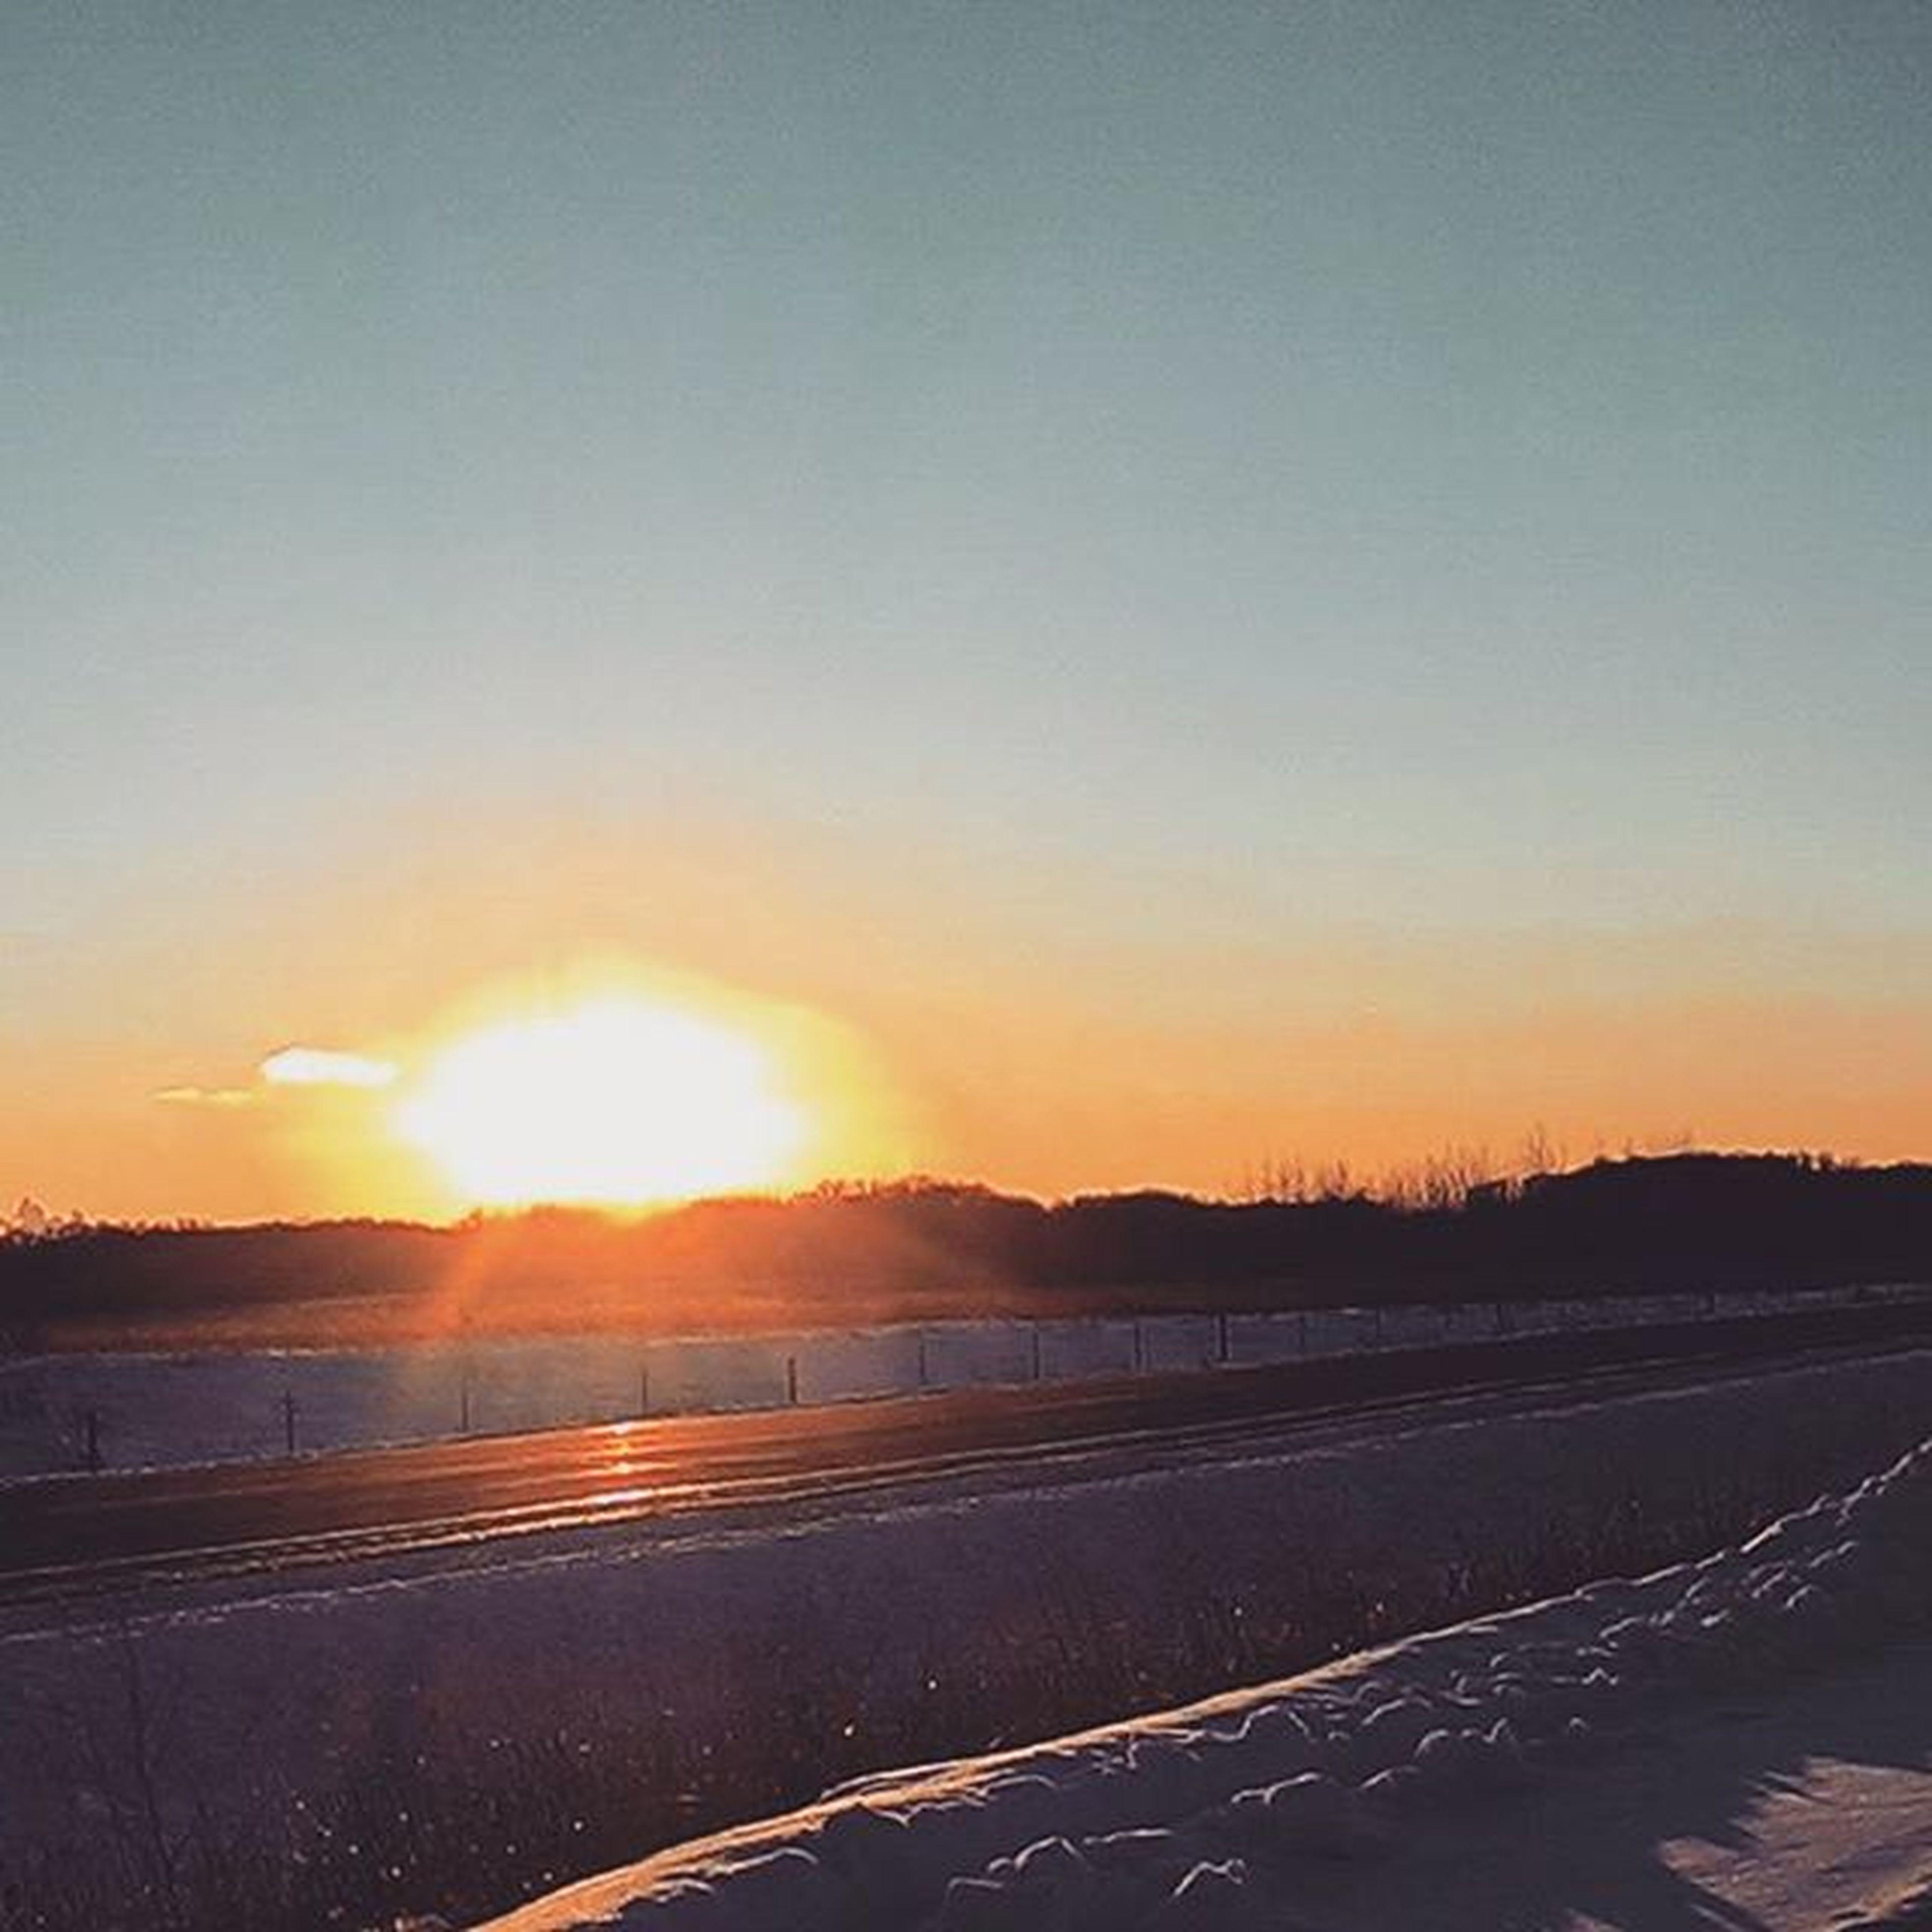 sunset, sun, orange color, tranquility, tranquil scene, scenics, beauty in nature, sunlight, nature, landscape, clear sky, copy space, sunbeam, idyllic, sky, road, transportation, outdoors, no people, field